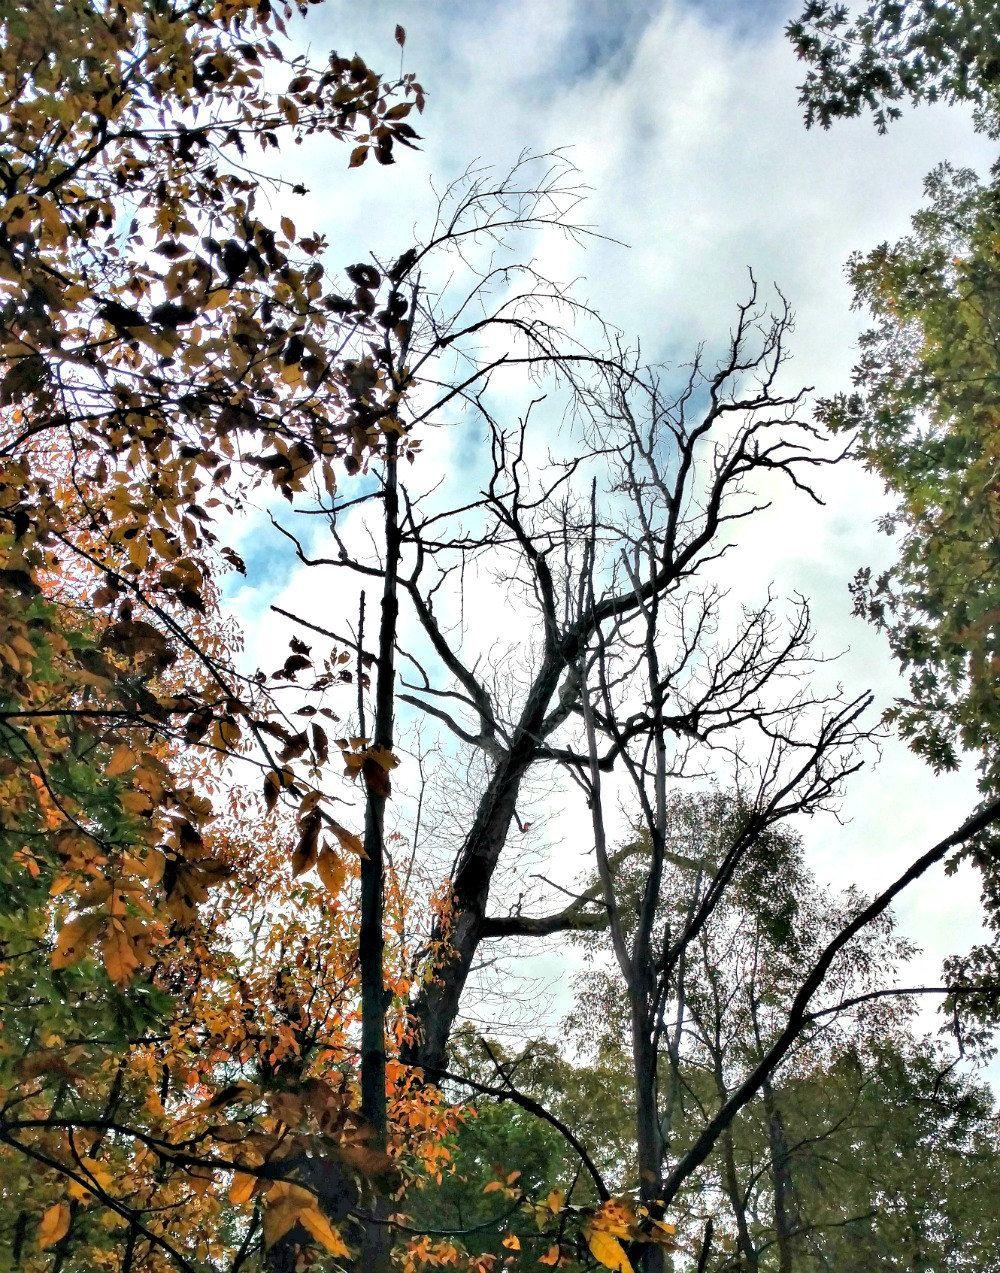 Asylum Lake Preserve Kalamazoo Michigan Color Photography Nature Photography Trees Leaves S Nature Photography Trees Nature Photography Autumn Landscape